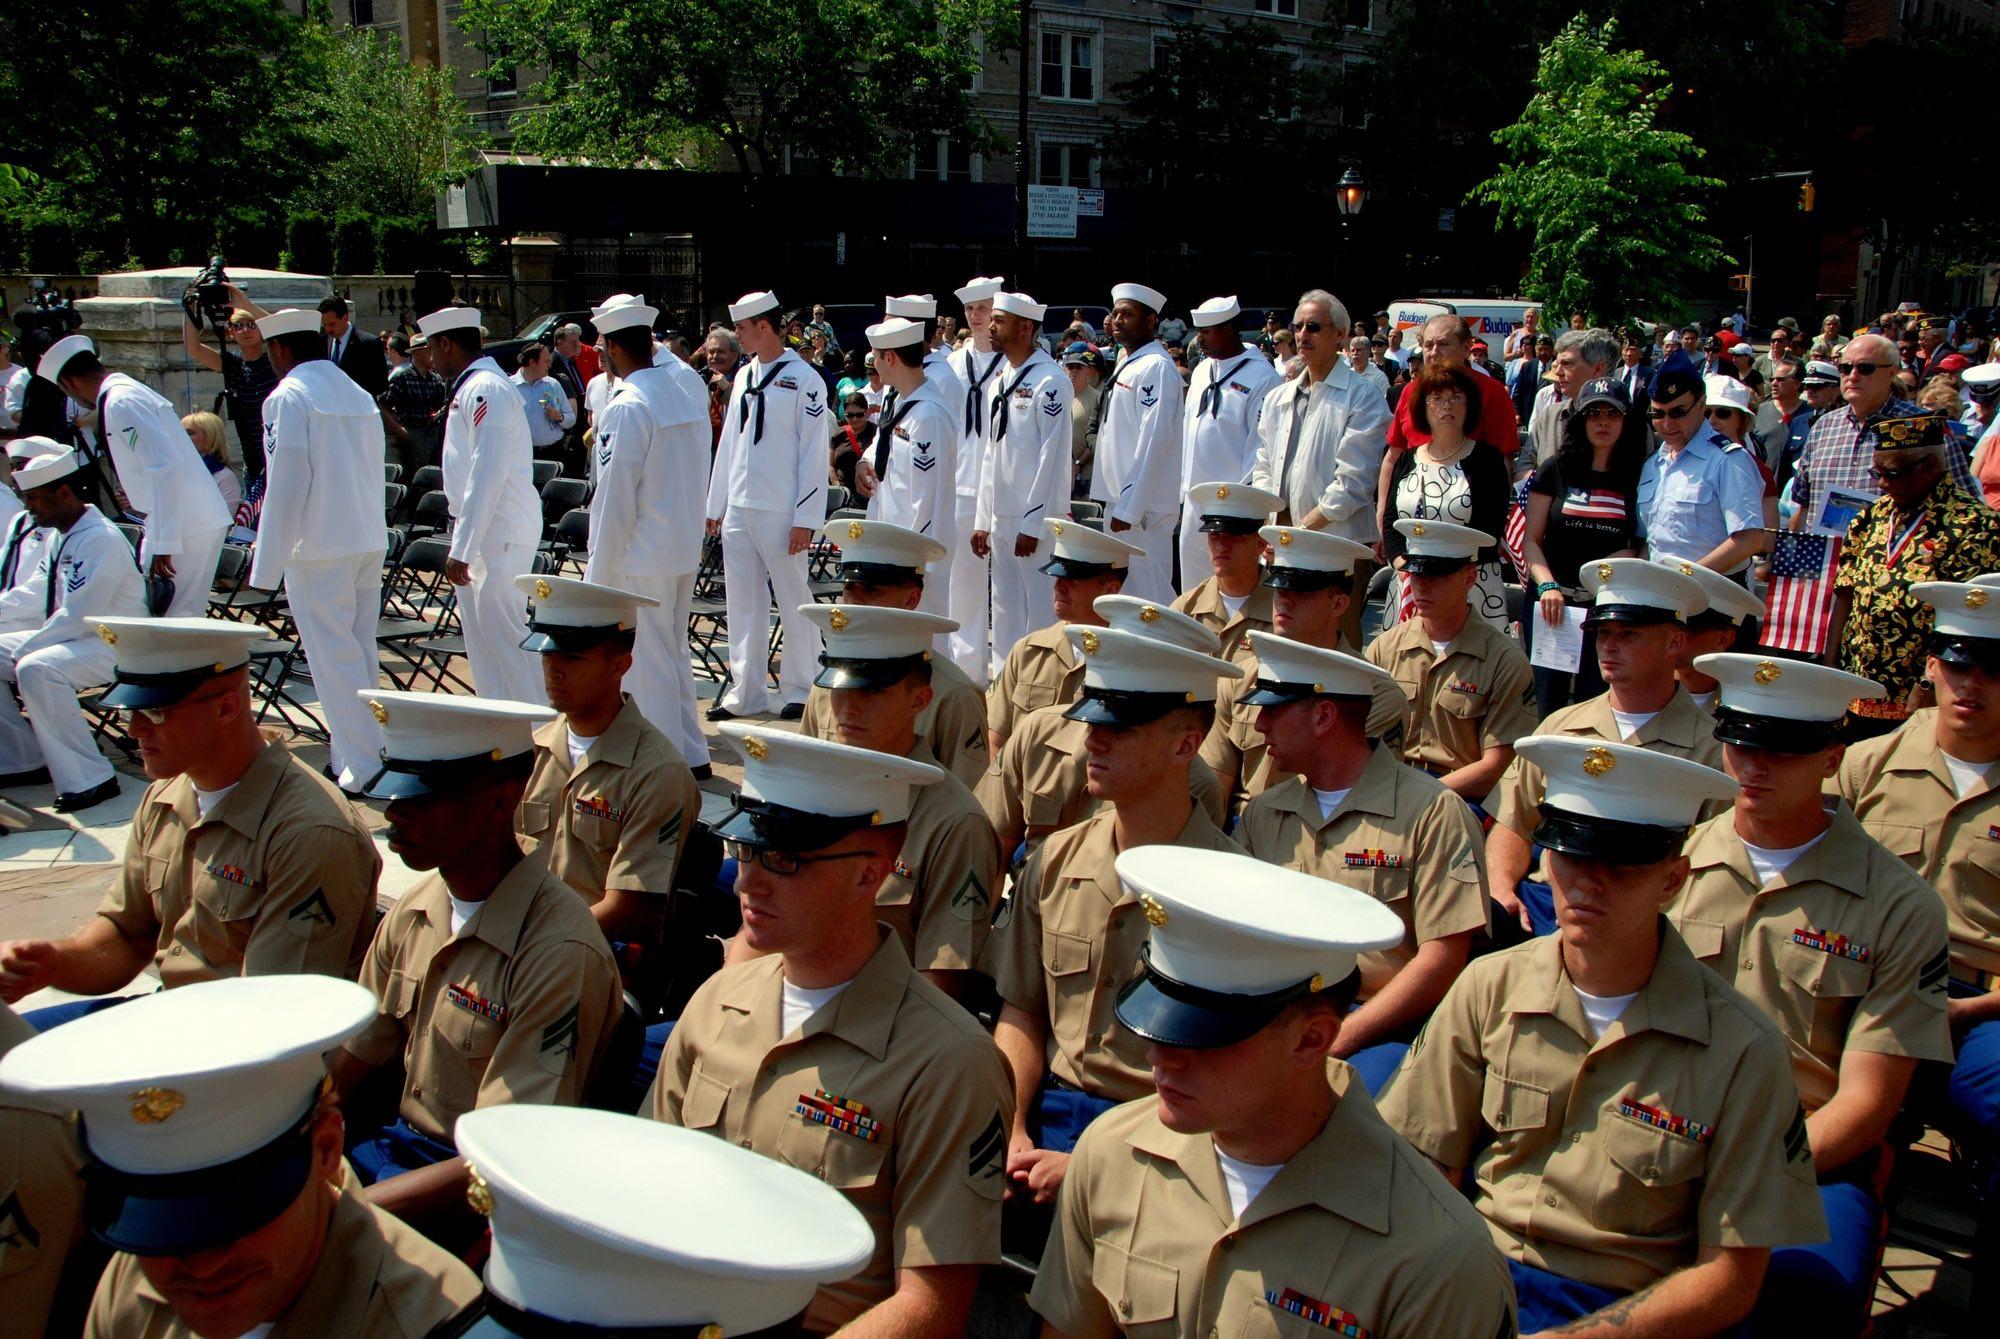 Marines and Sailors